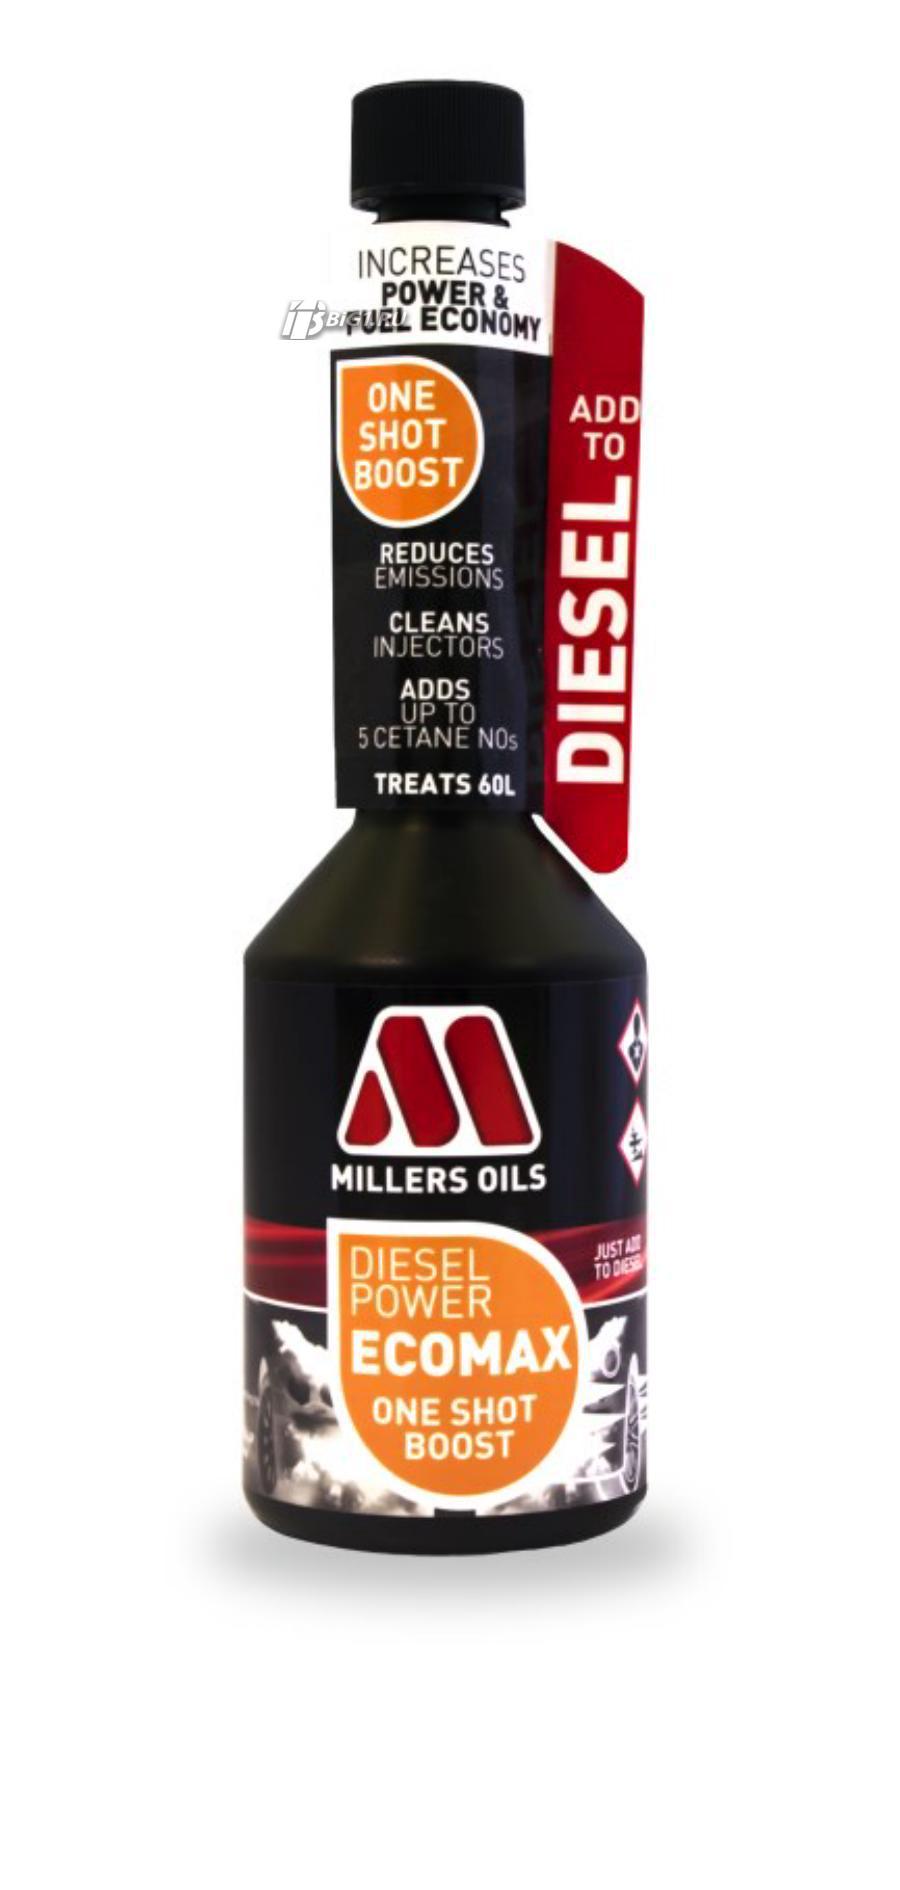 Октан-корректор и присадка для топлива Diesel Power ECOMAX One Shot Boost